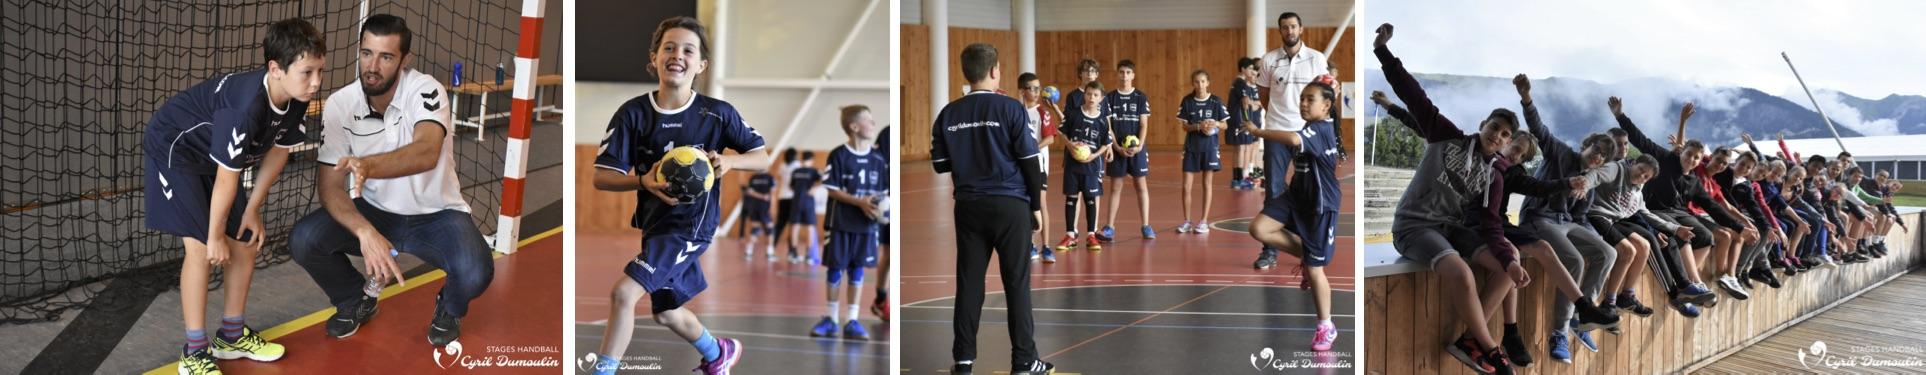 stage-handball-dumoulin-1-1